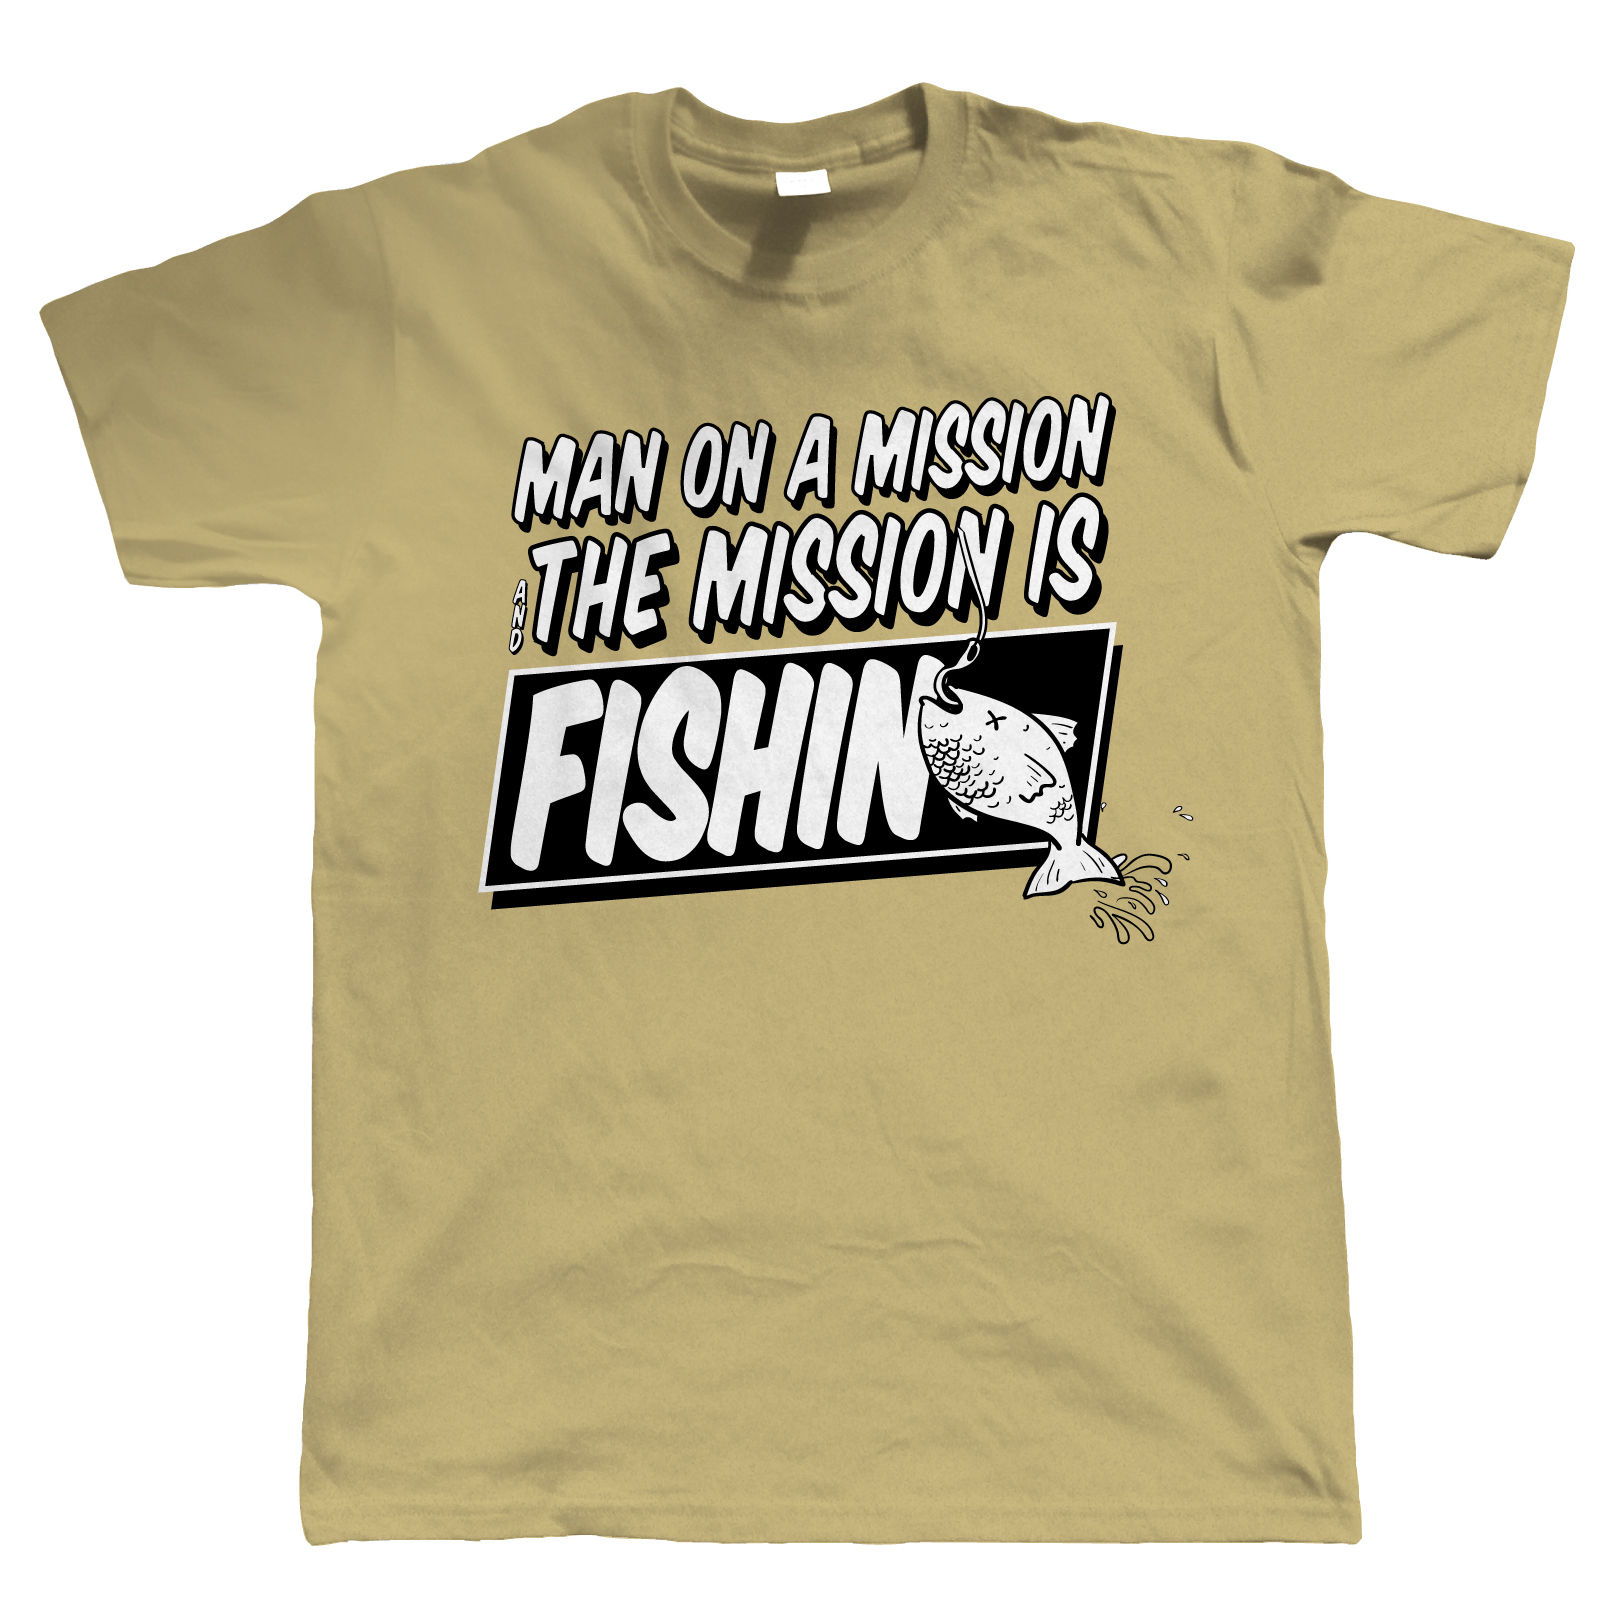 Man on a mission funny fishing t shirt carp angler sea for 4xl fishing shirts